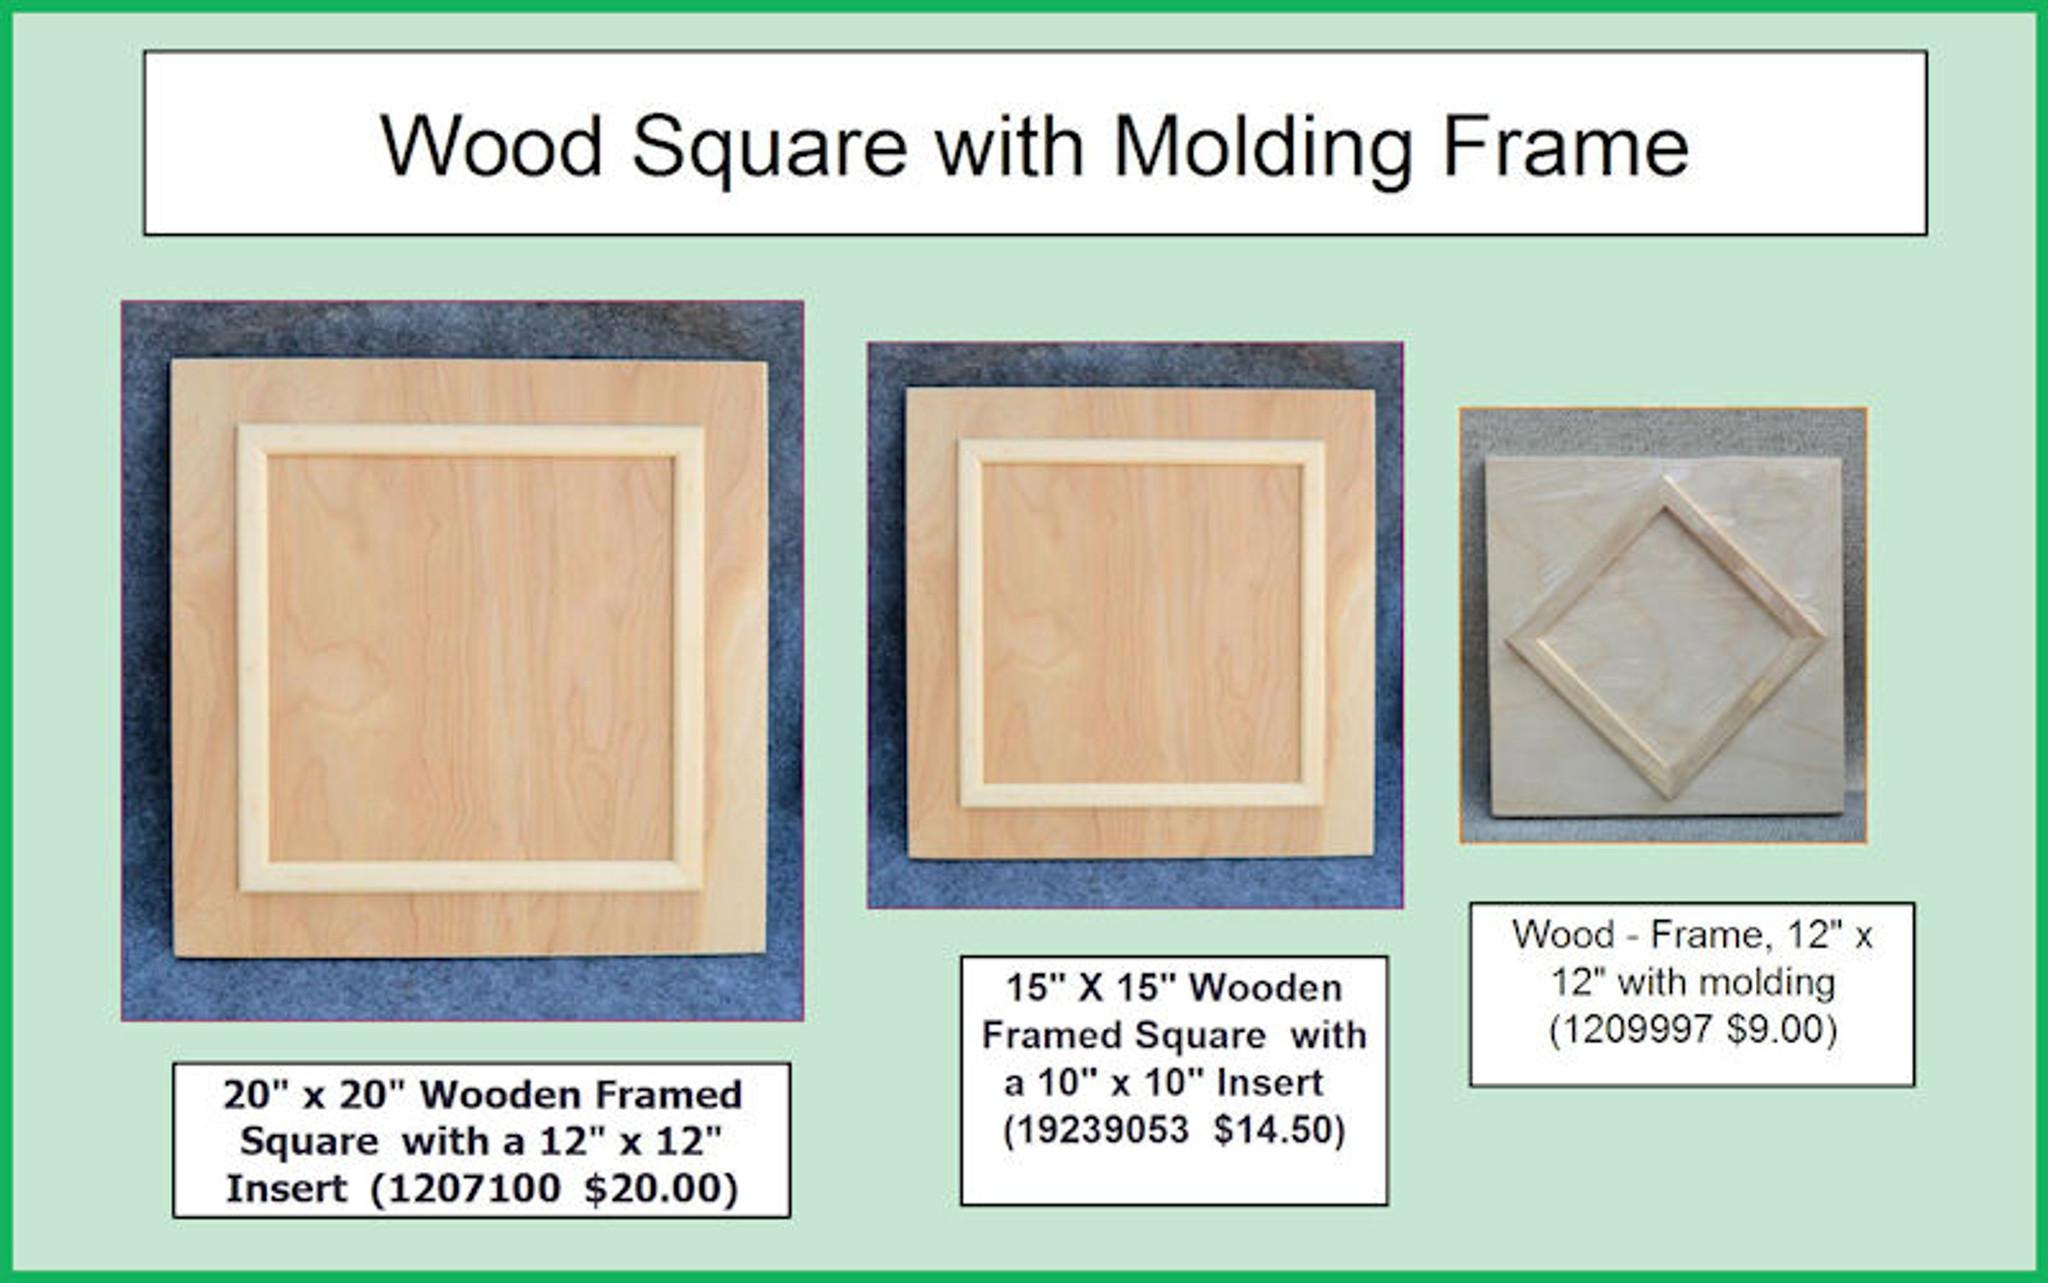 Wood - Framed Square - 3 Sizes 20